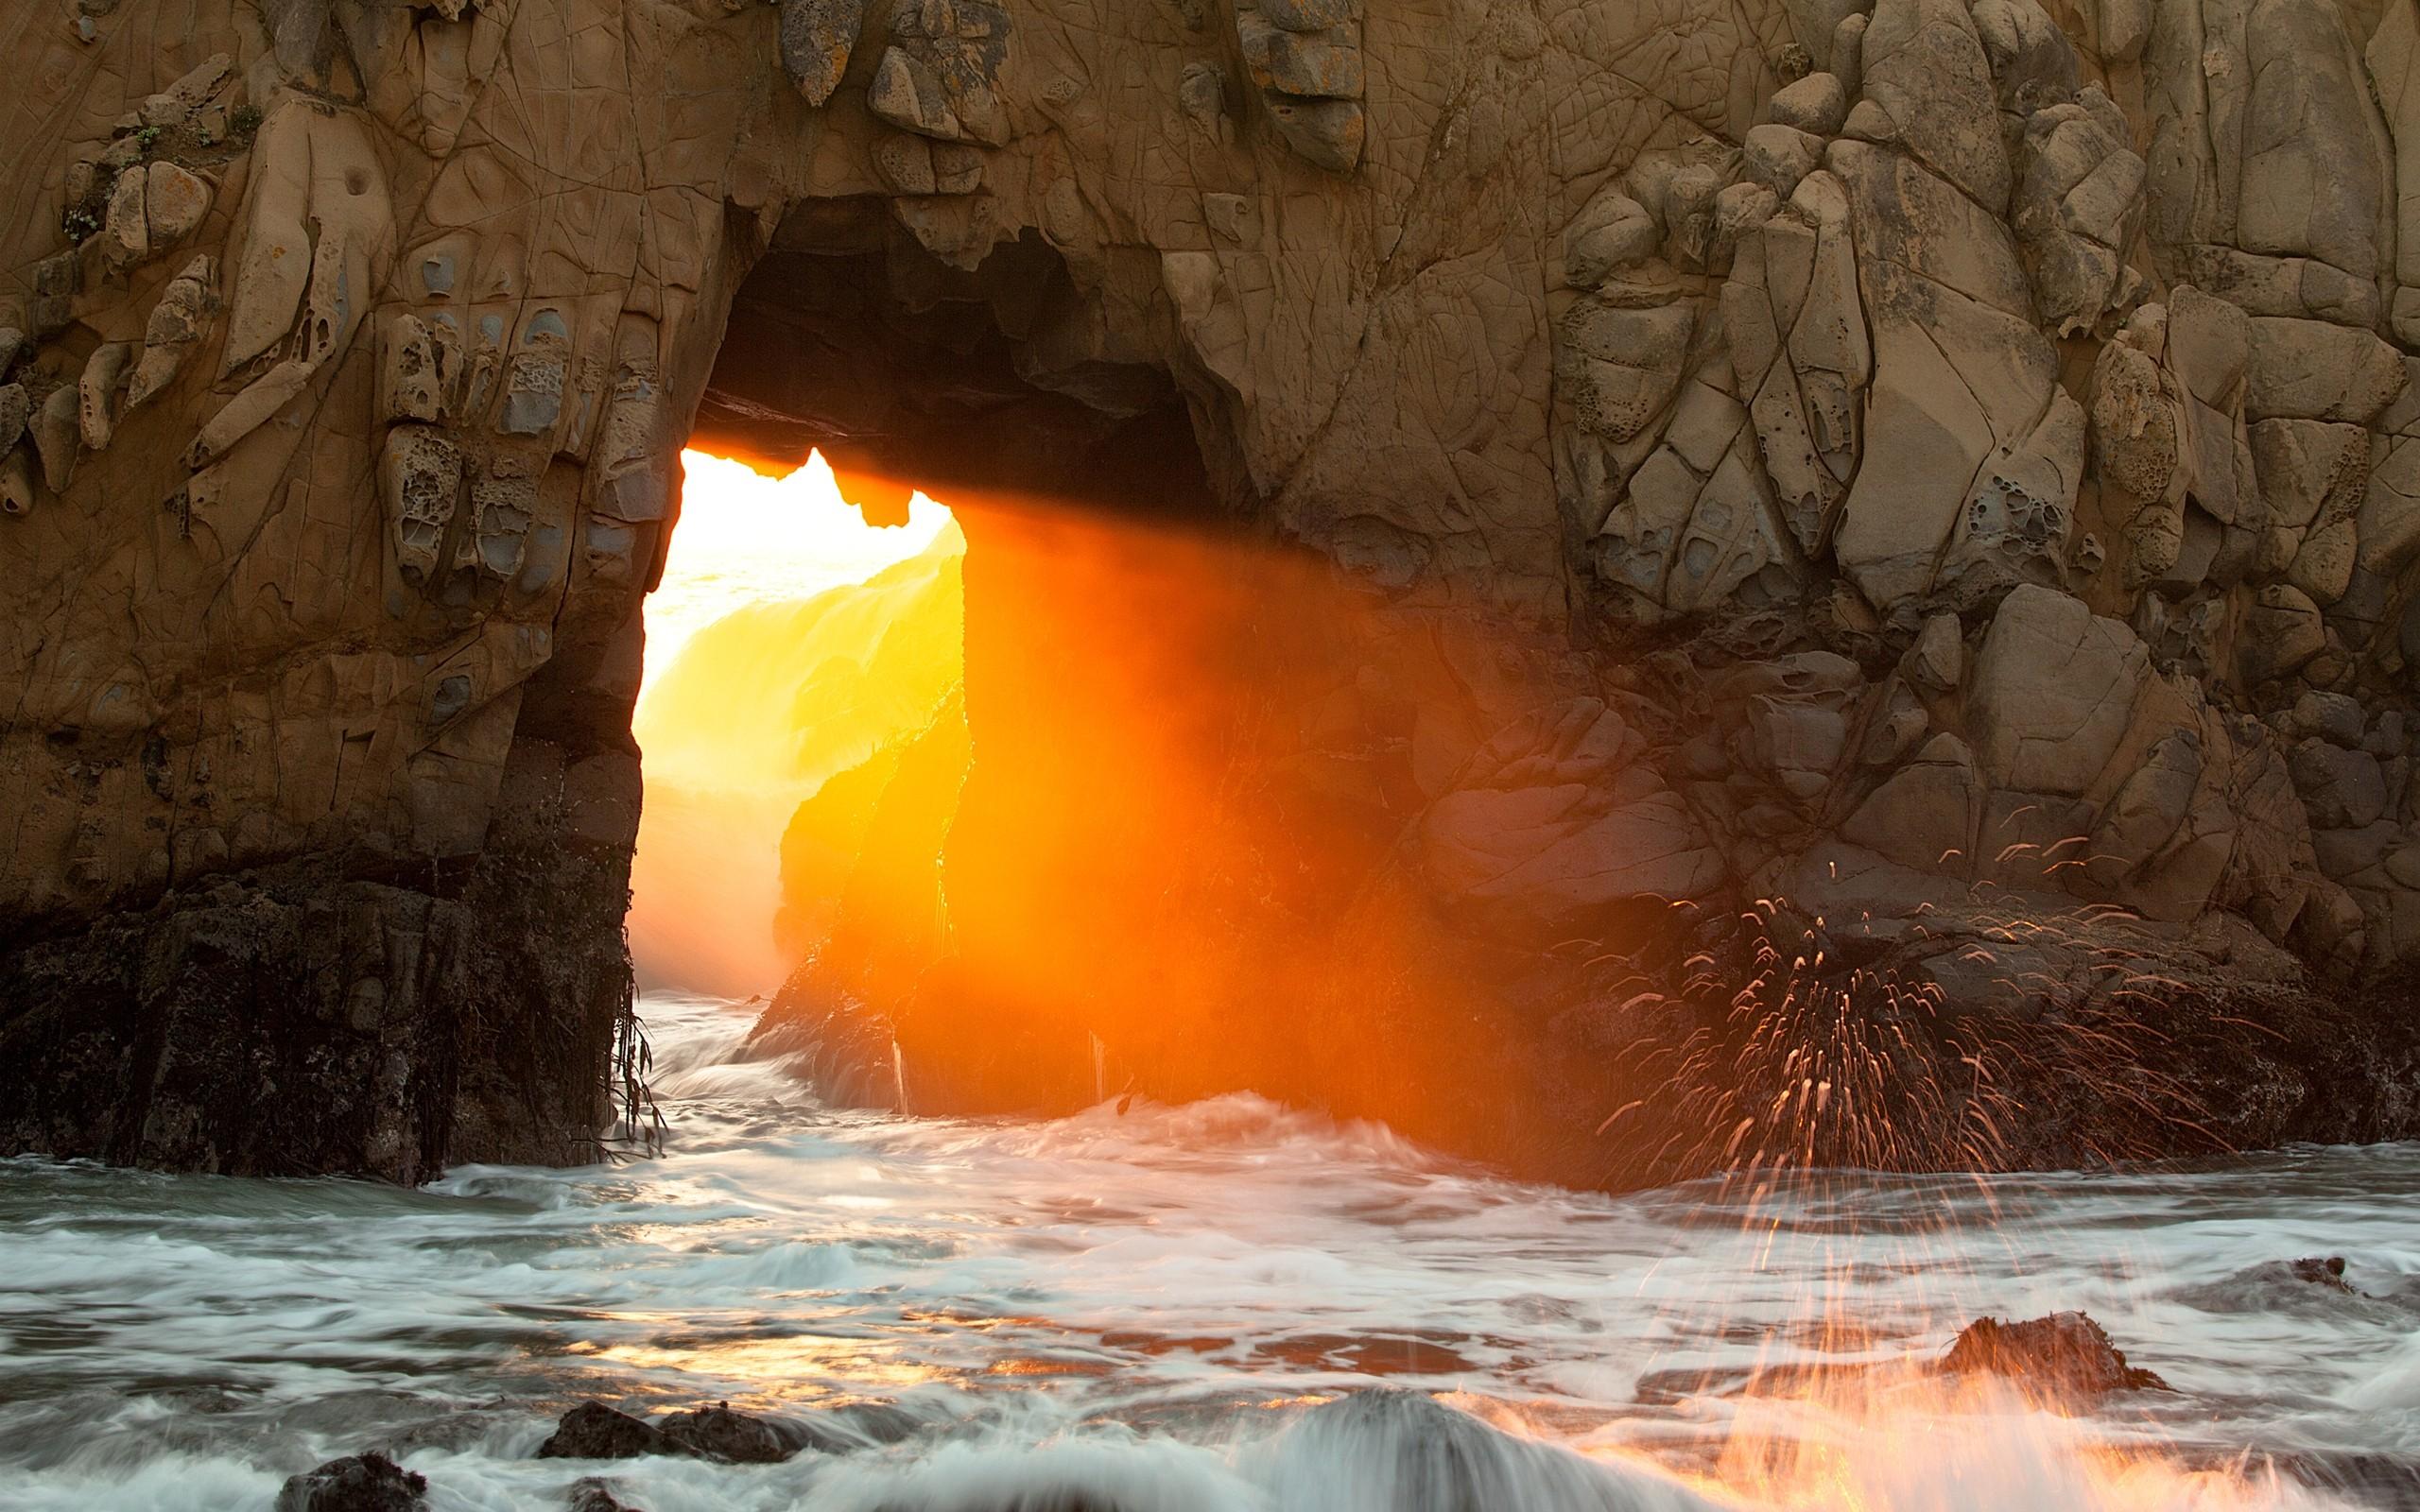 sunrise pictures rocks